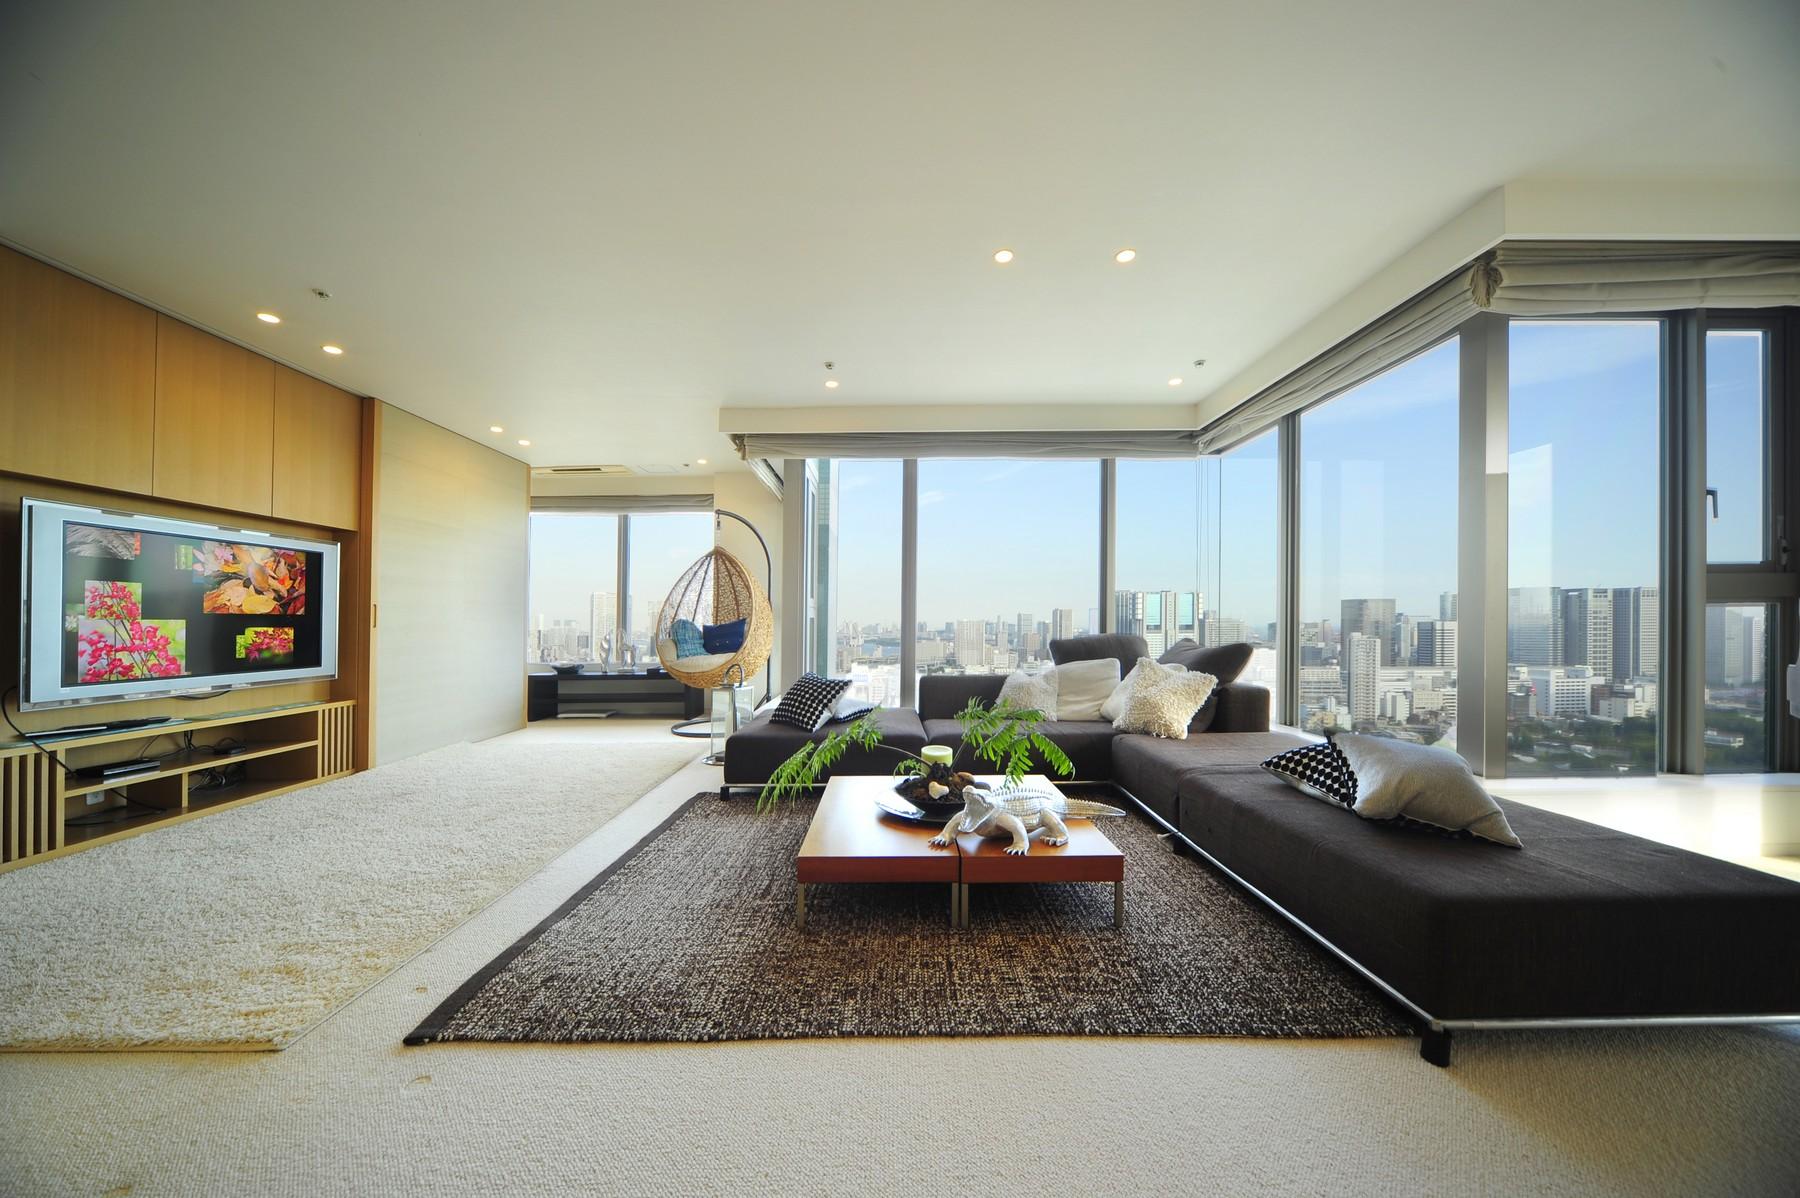 Appartement pour l Vente à City Tower Takanawa Takanawa, Minato-Ku, Tokyo Japon